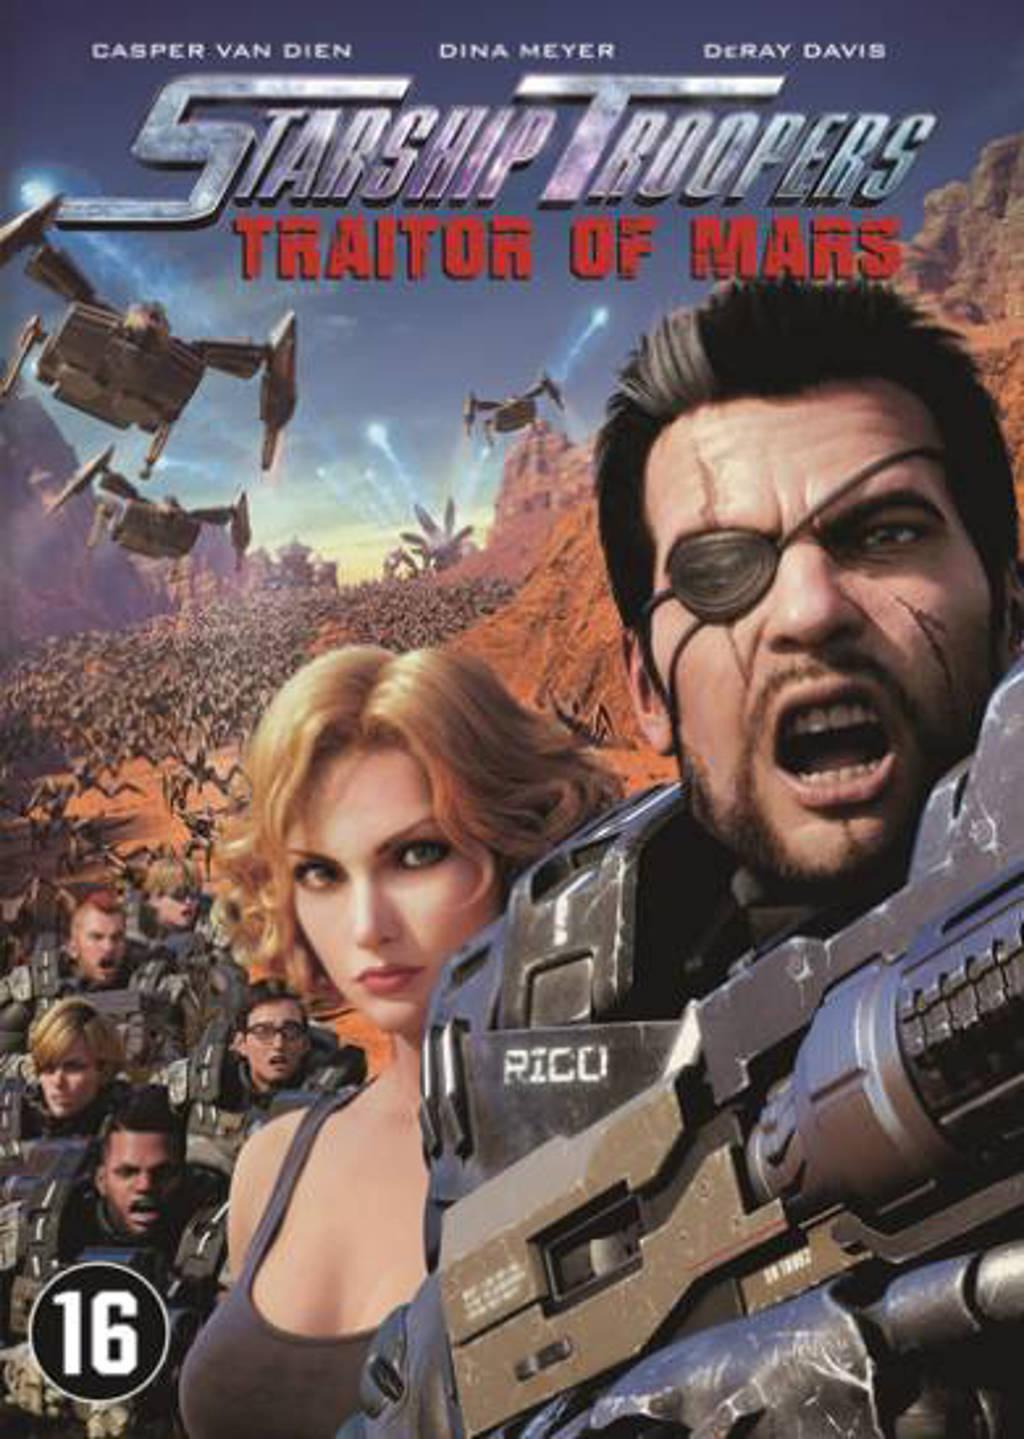 Starship Troopers - Traitor of Mars (DVD)